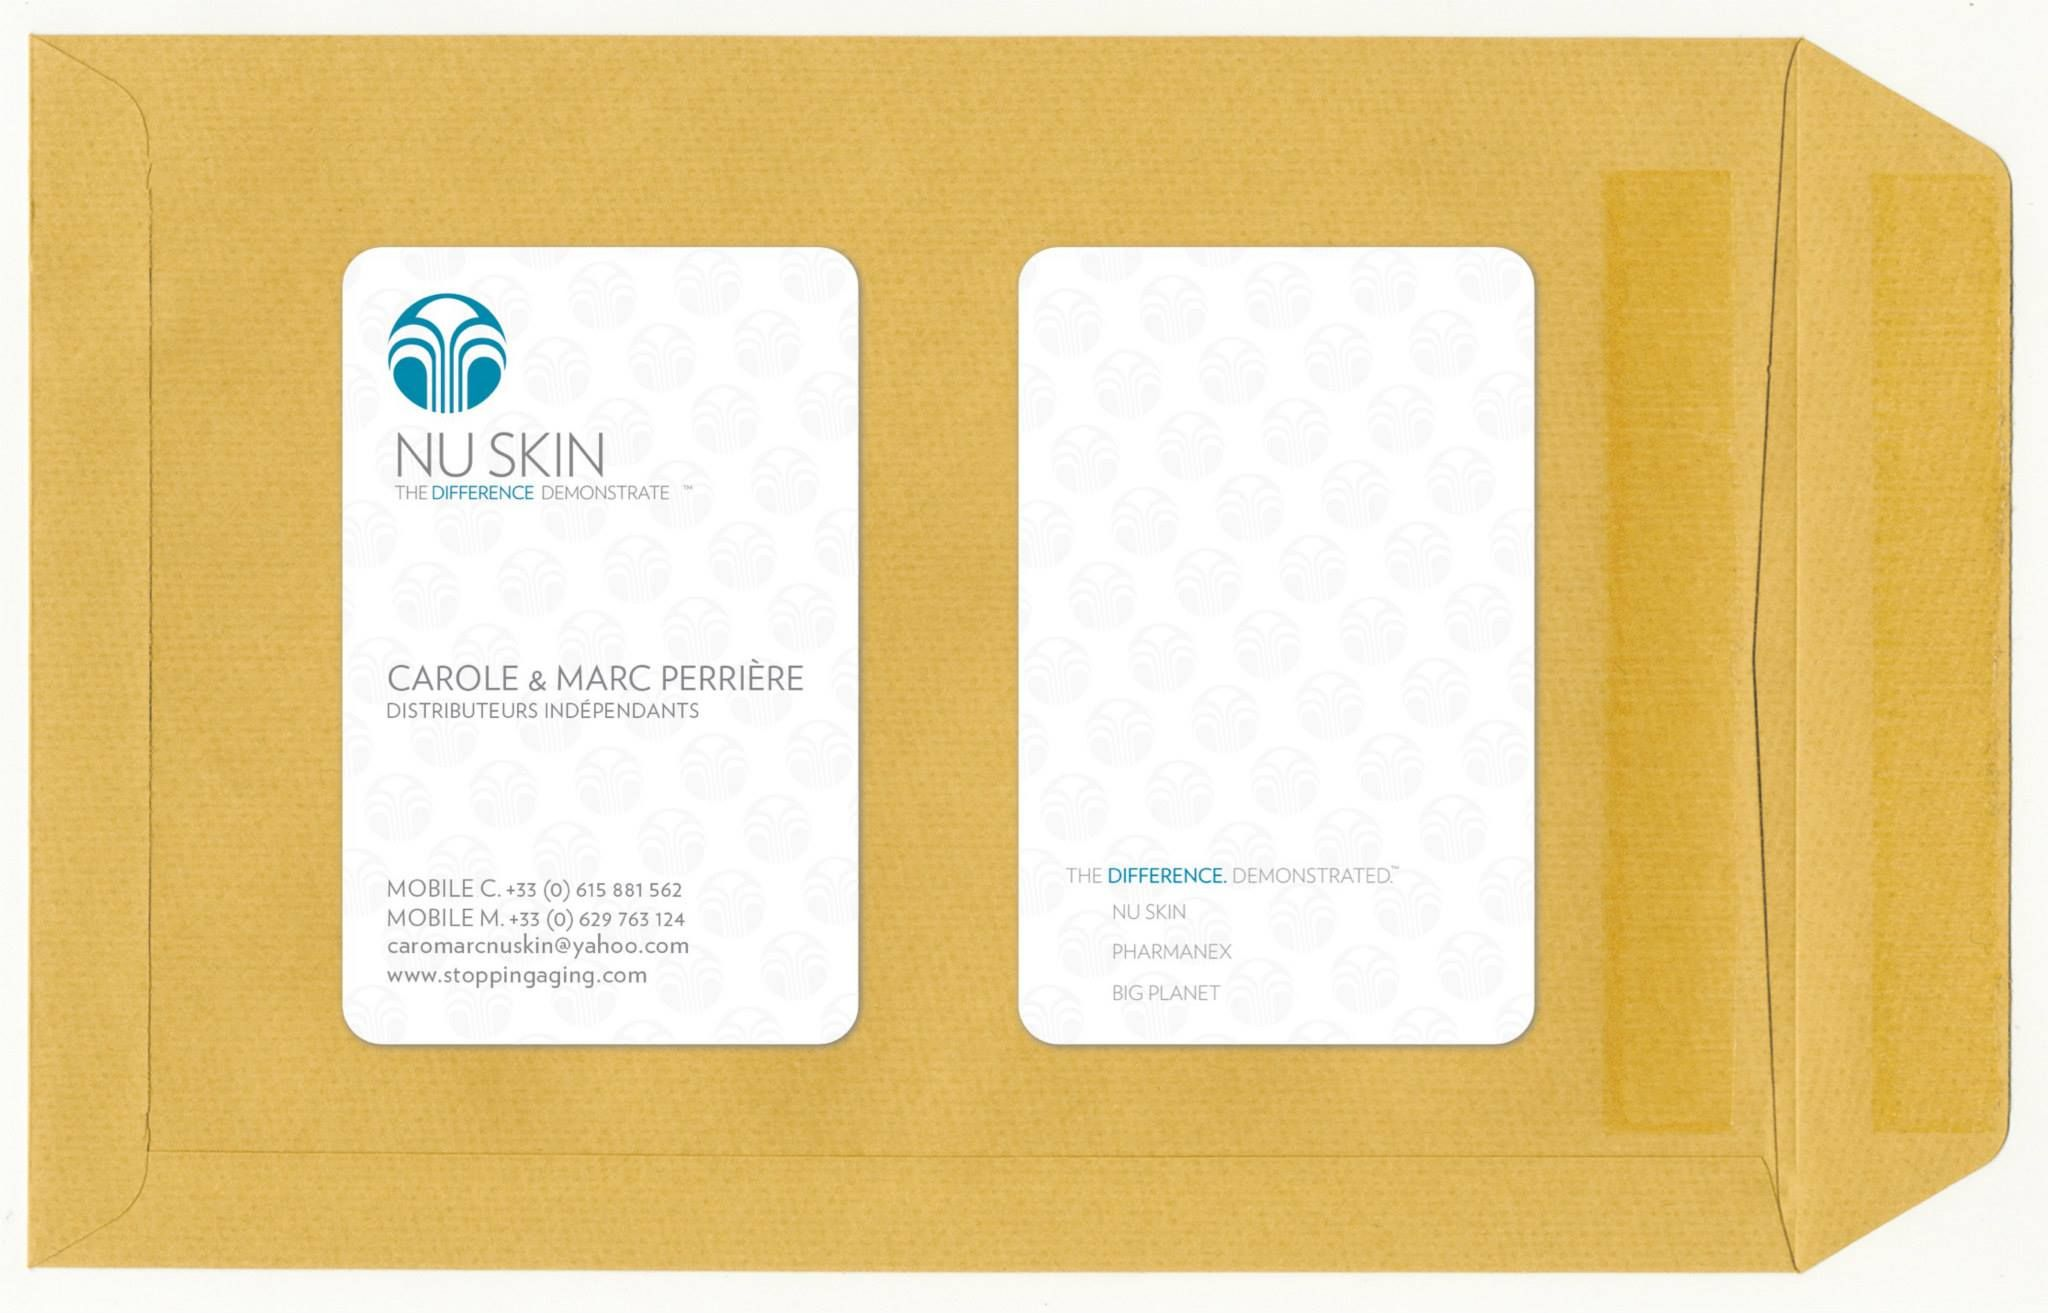 Carte De Viste Pour NU SKIN Creation Et Impression Bord Rond Vernis Selectif Inside